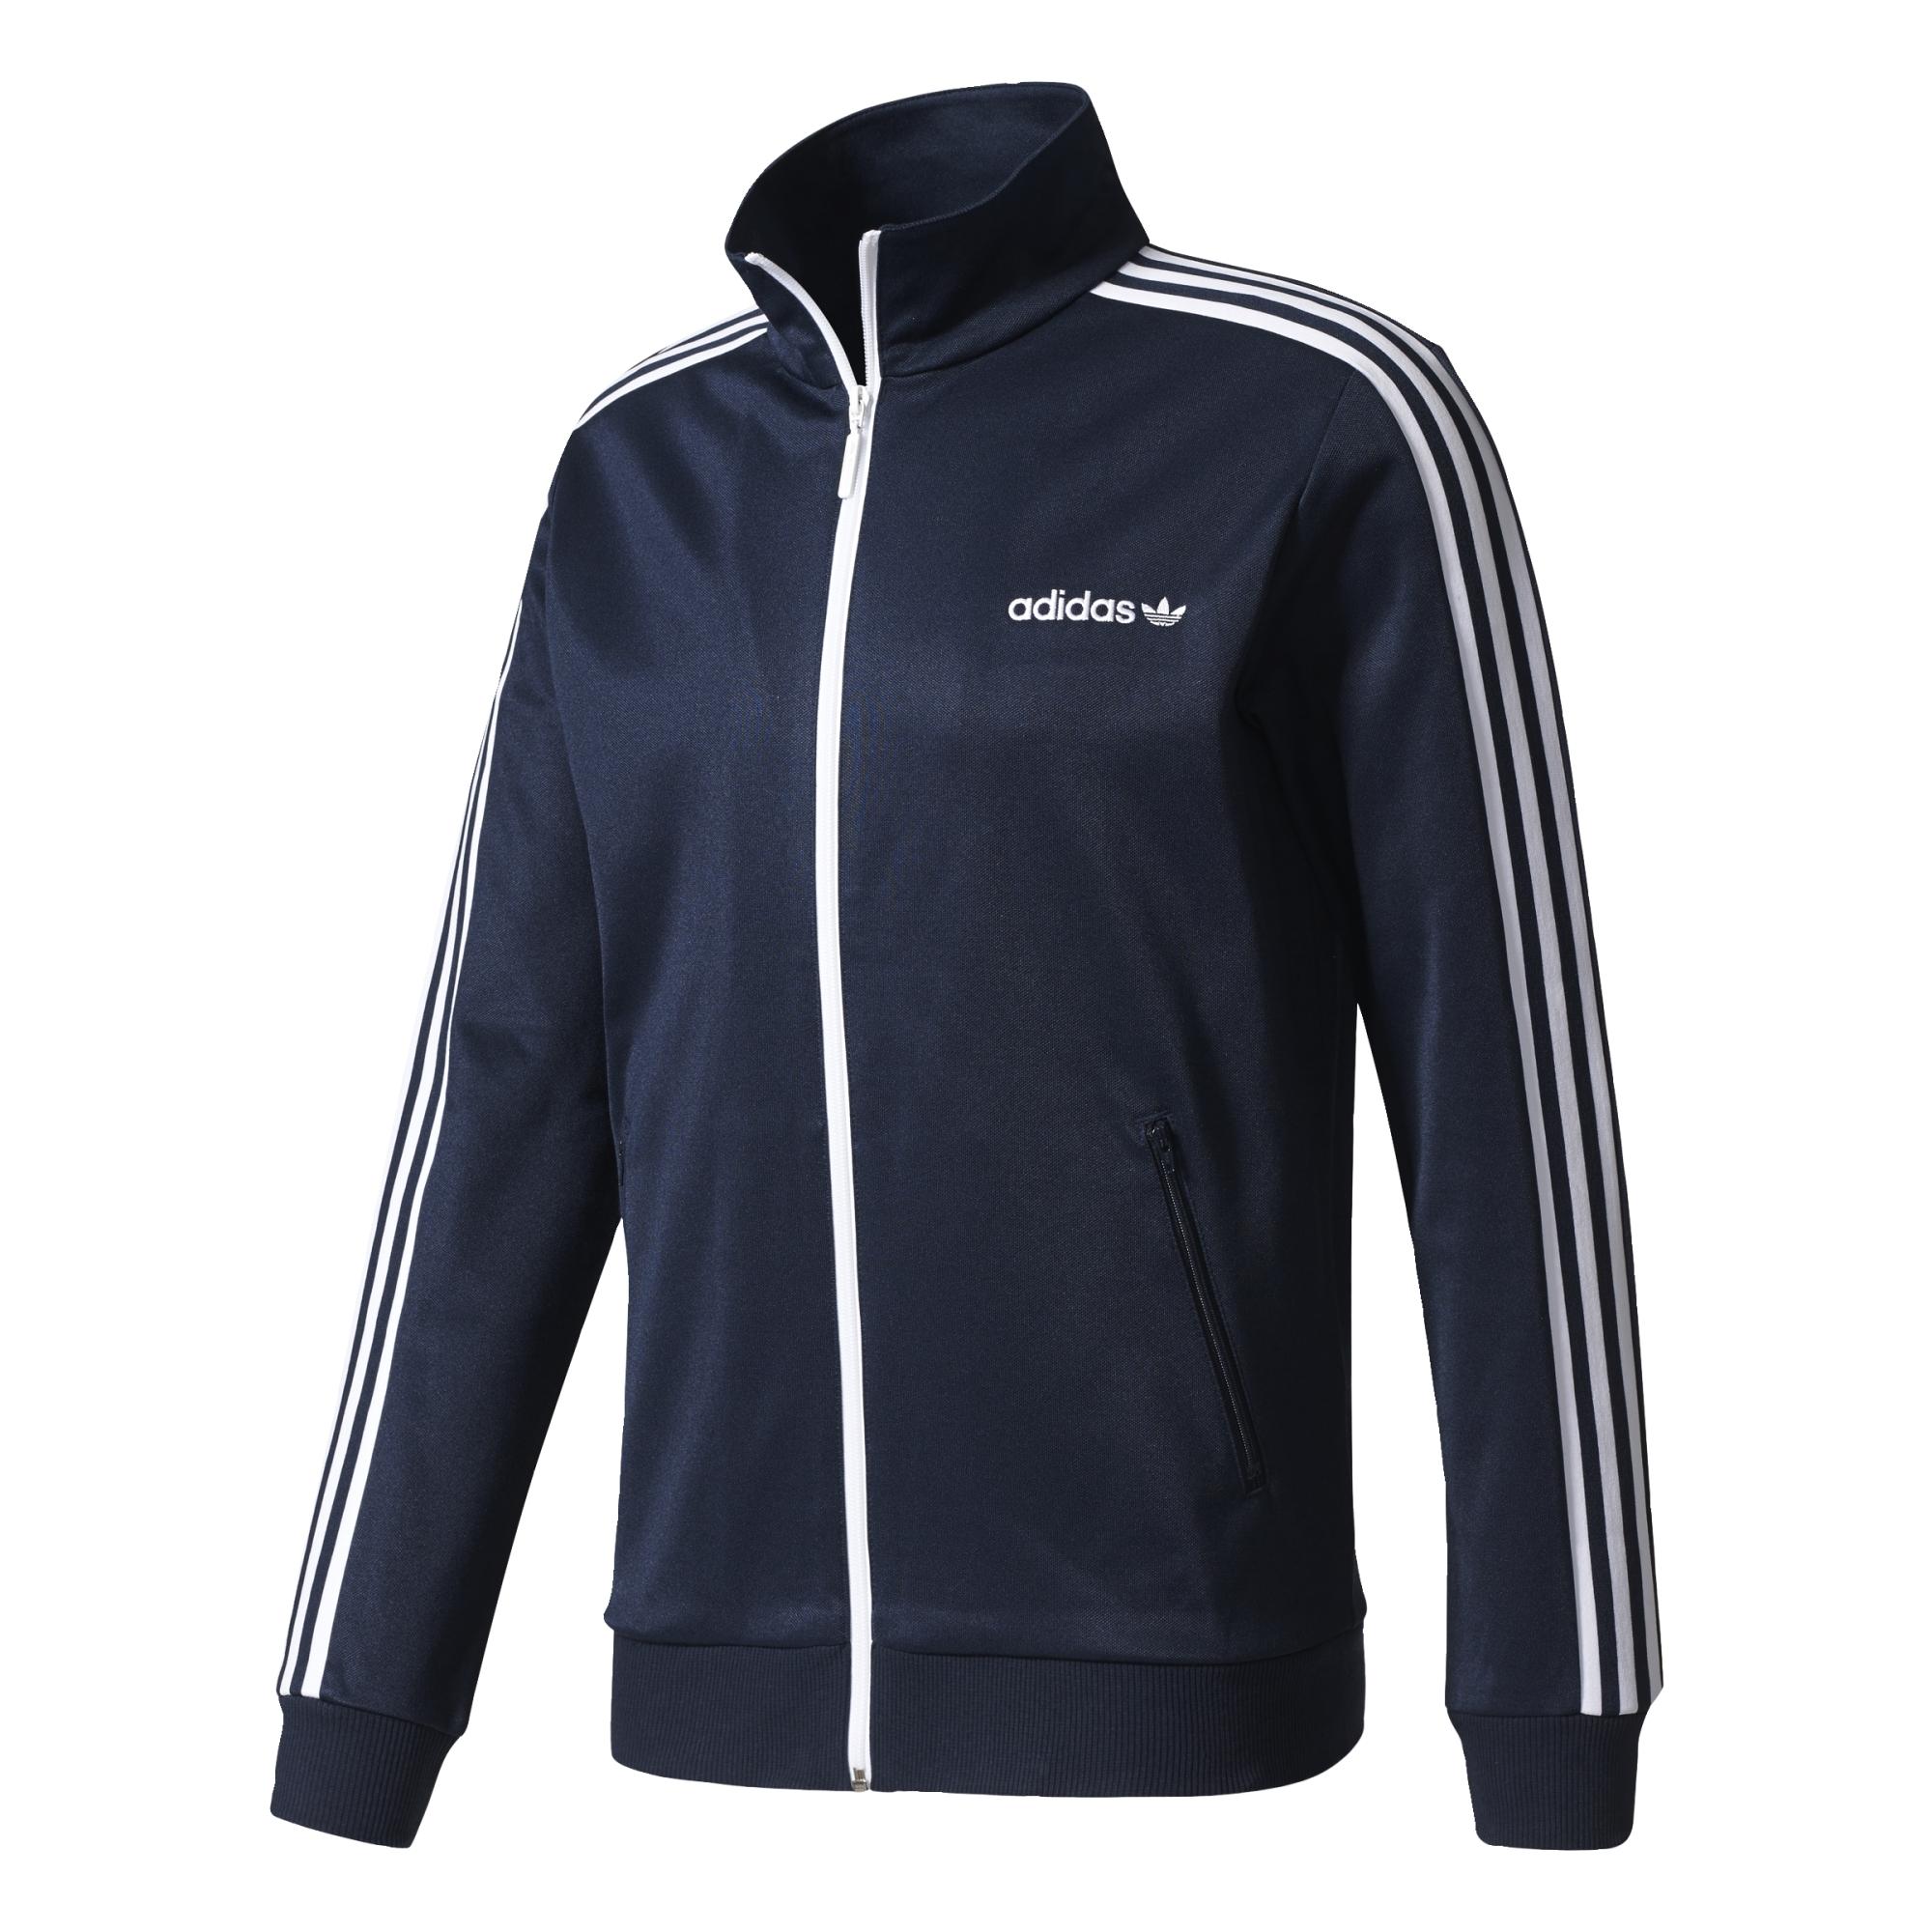 legend Originals Top Beckenbauer Track Ink Adidas pwxgq0PSFF